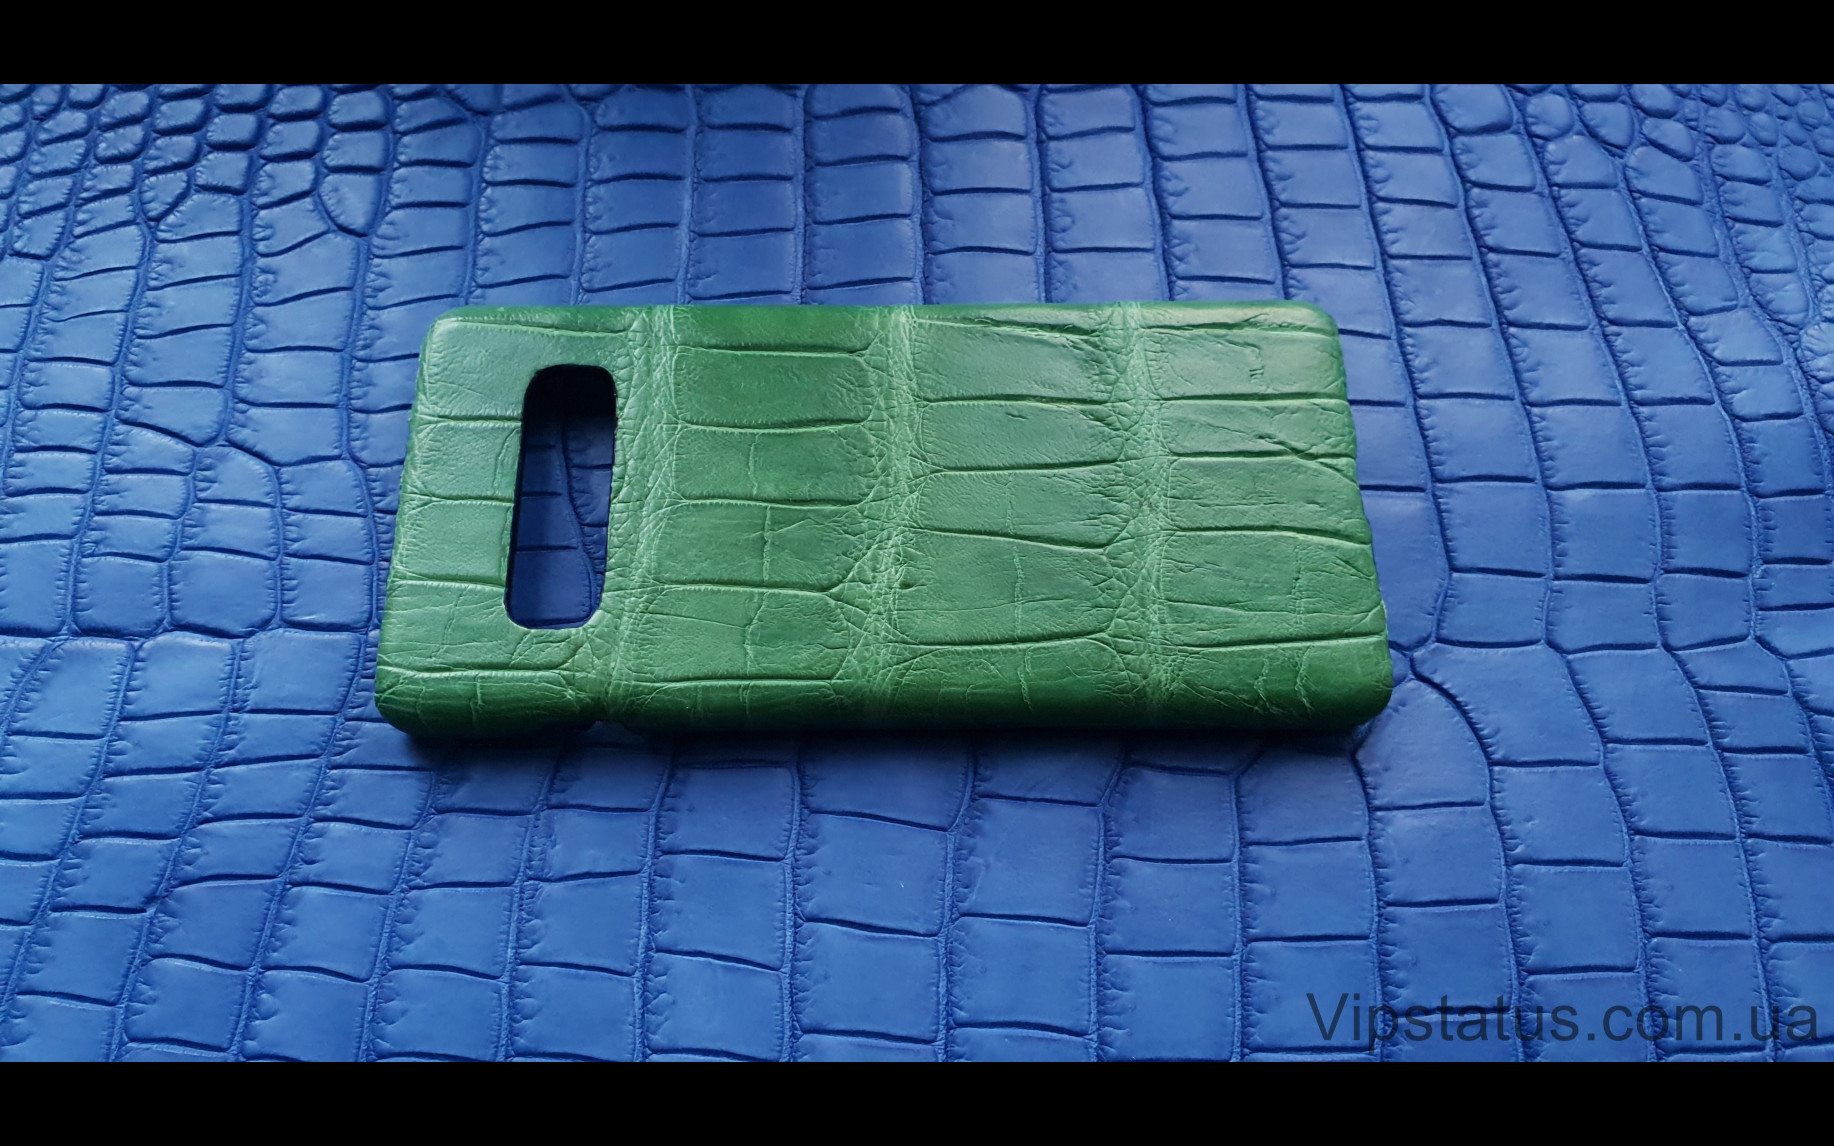 Elite Light Green Экзотический чехол Samsung Galaxy S10 Plus Light Green Exotic case Samsung Galaxy S10 Plus Crocodile leather image 3